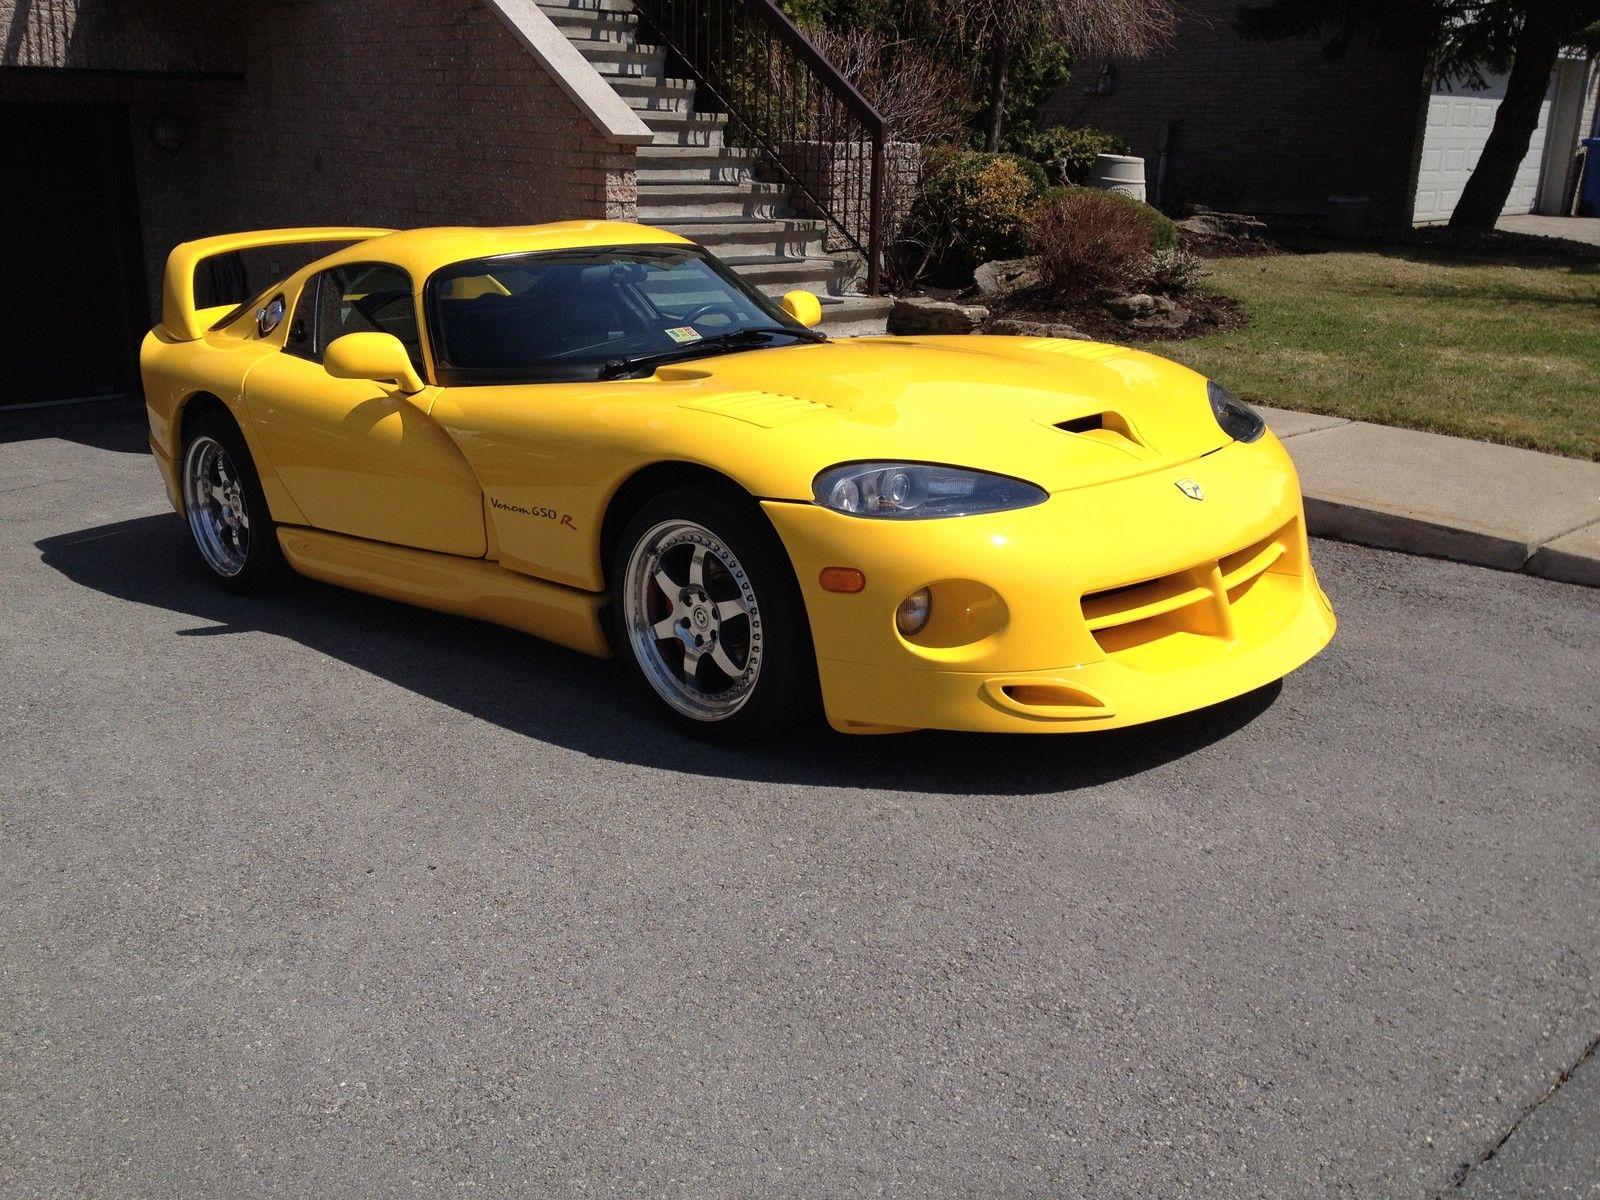 Dodge-Viper-GTS-Hennessey-Venom-R-wallpaper-wp5202915